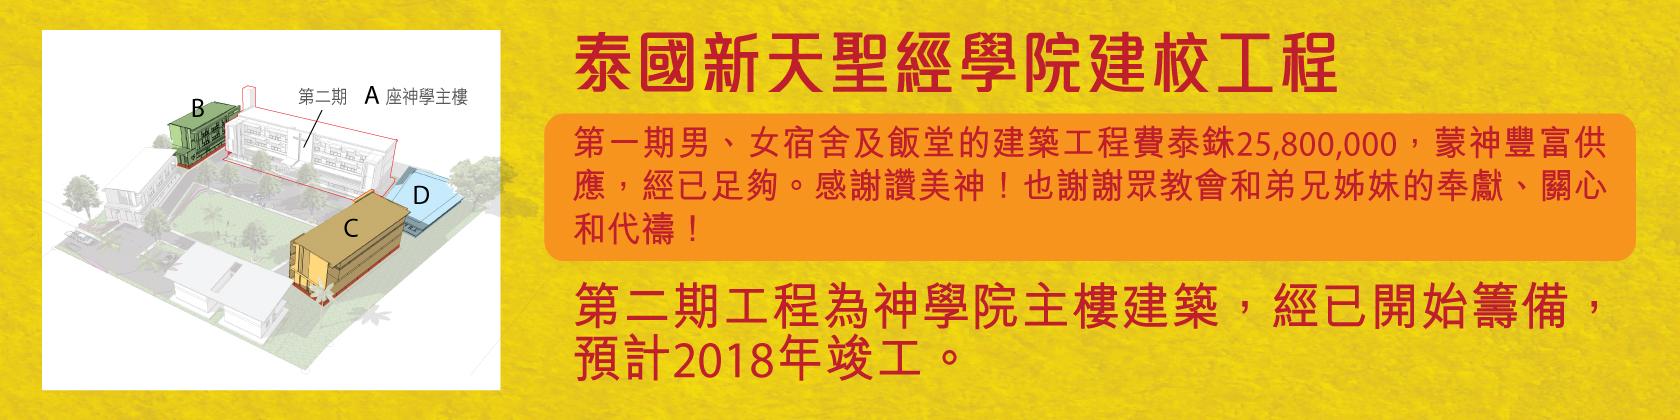 CB-02-web-banner-1680-x-420-024